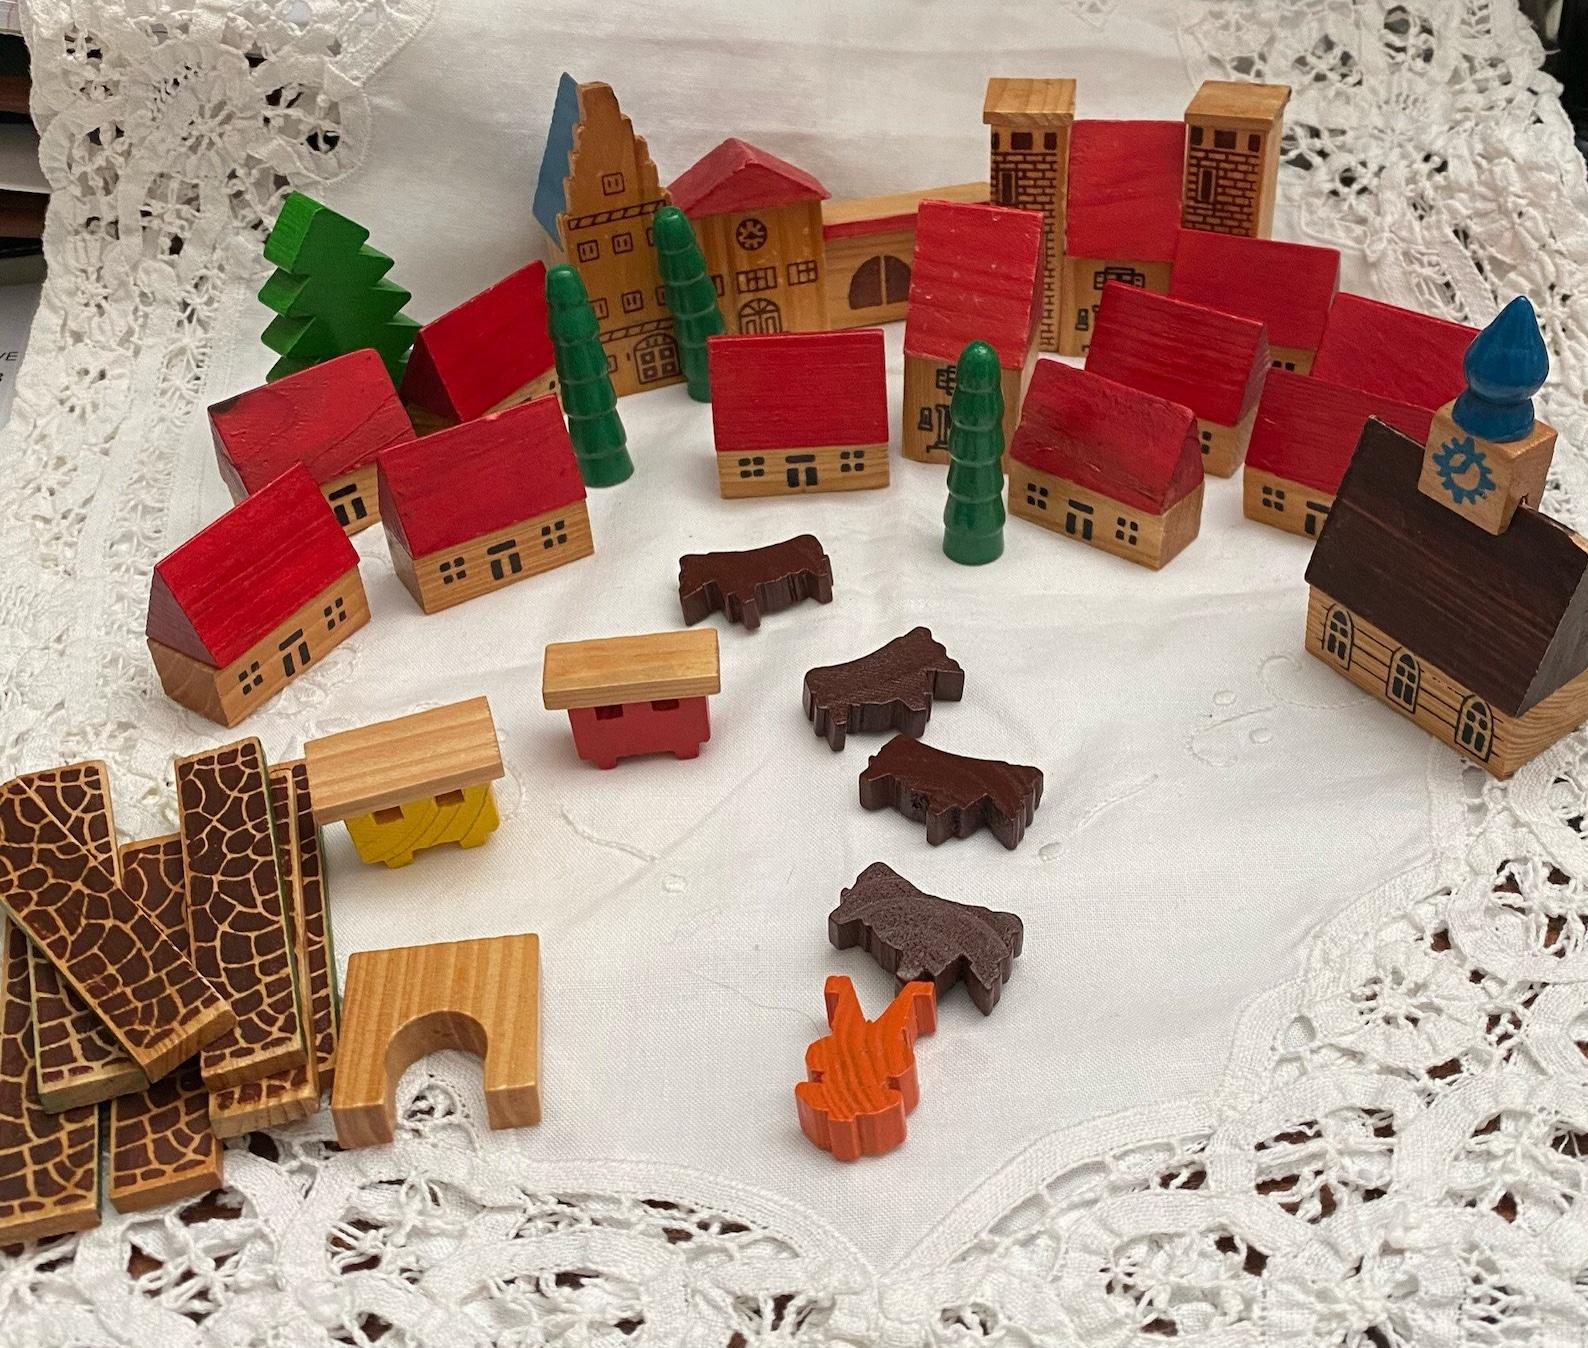 Erzebirge German wooden village, miniature town, play set, Christmas decor, vintage